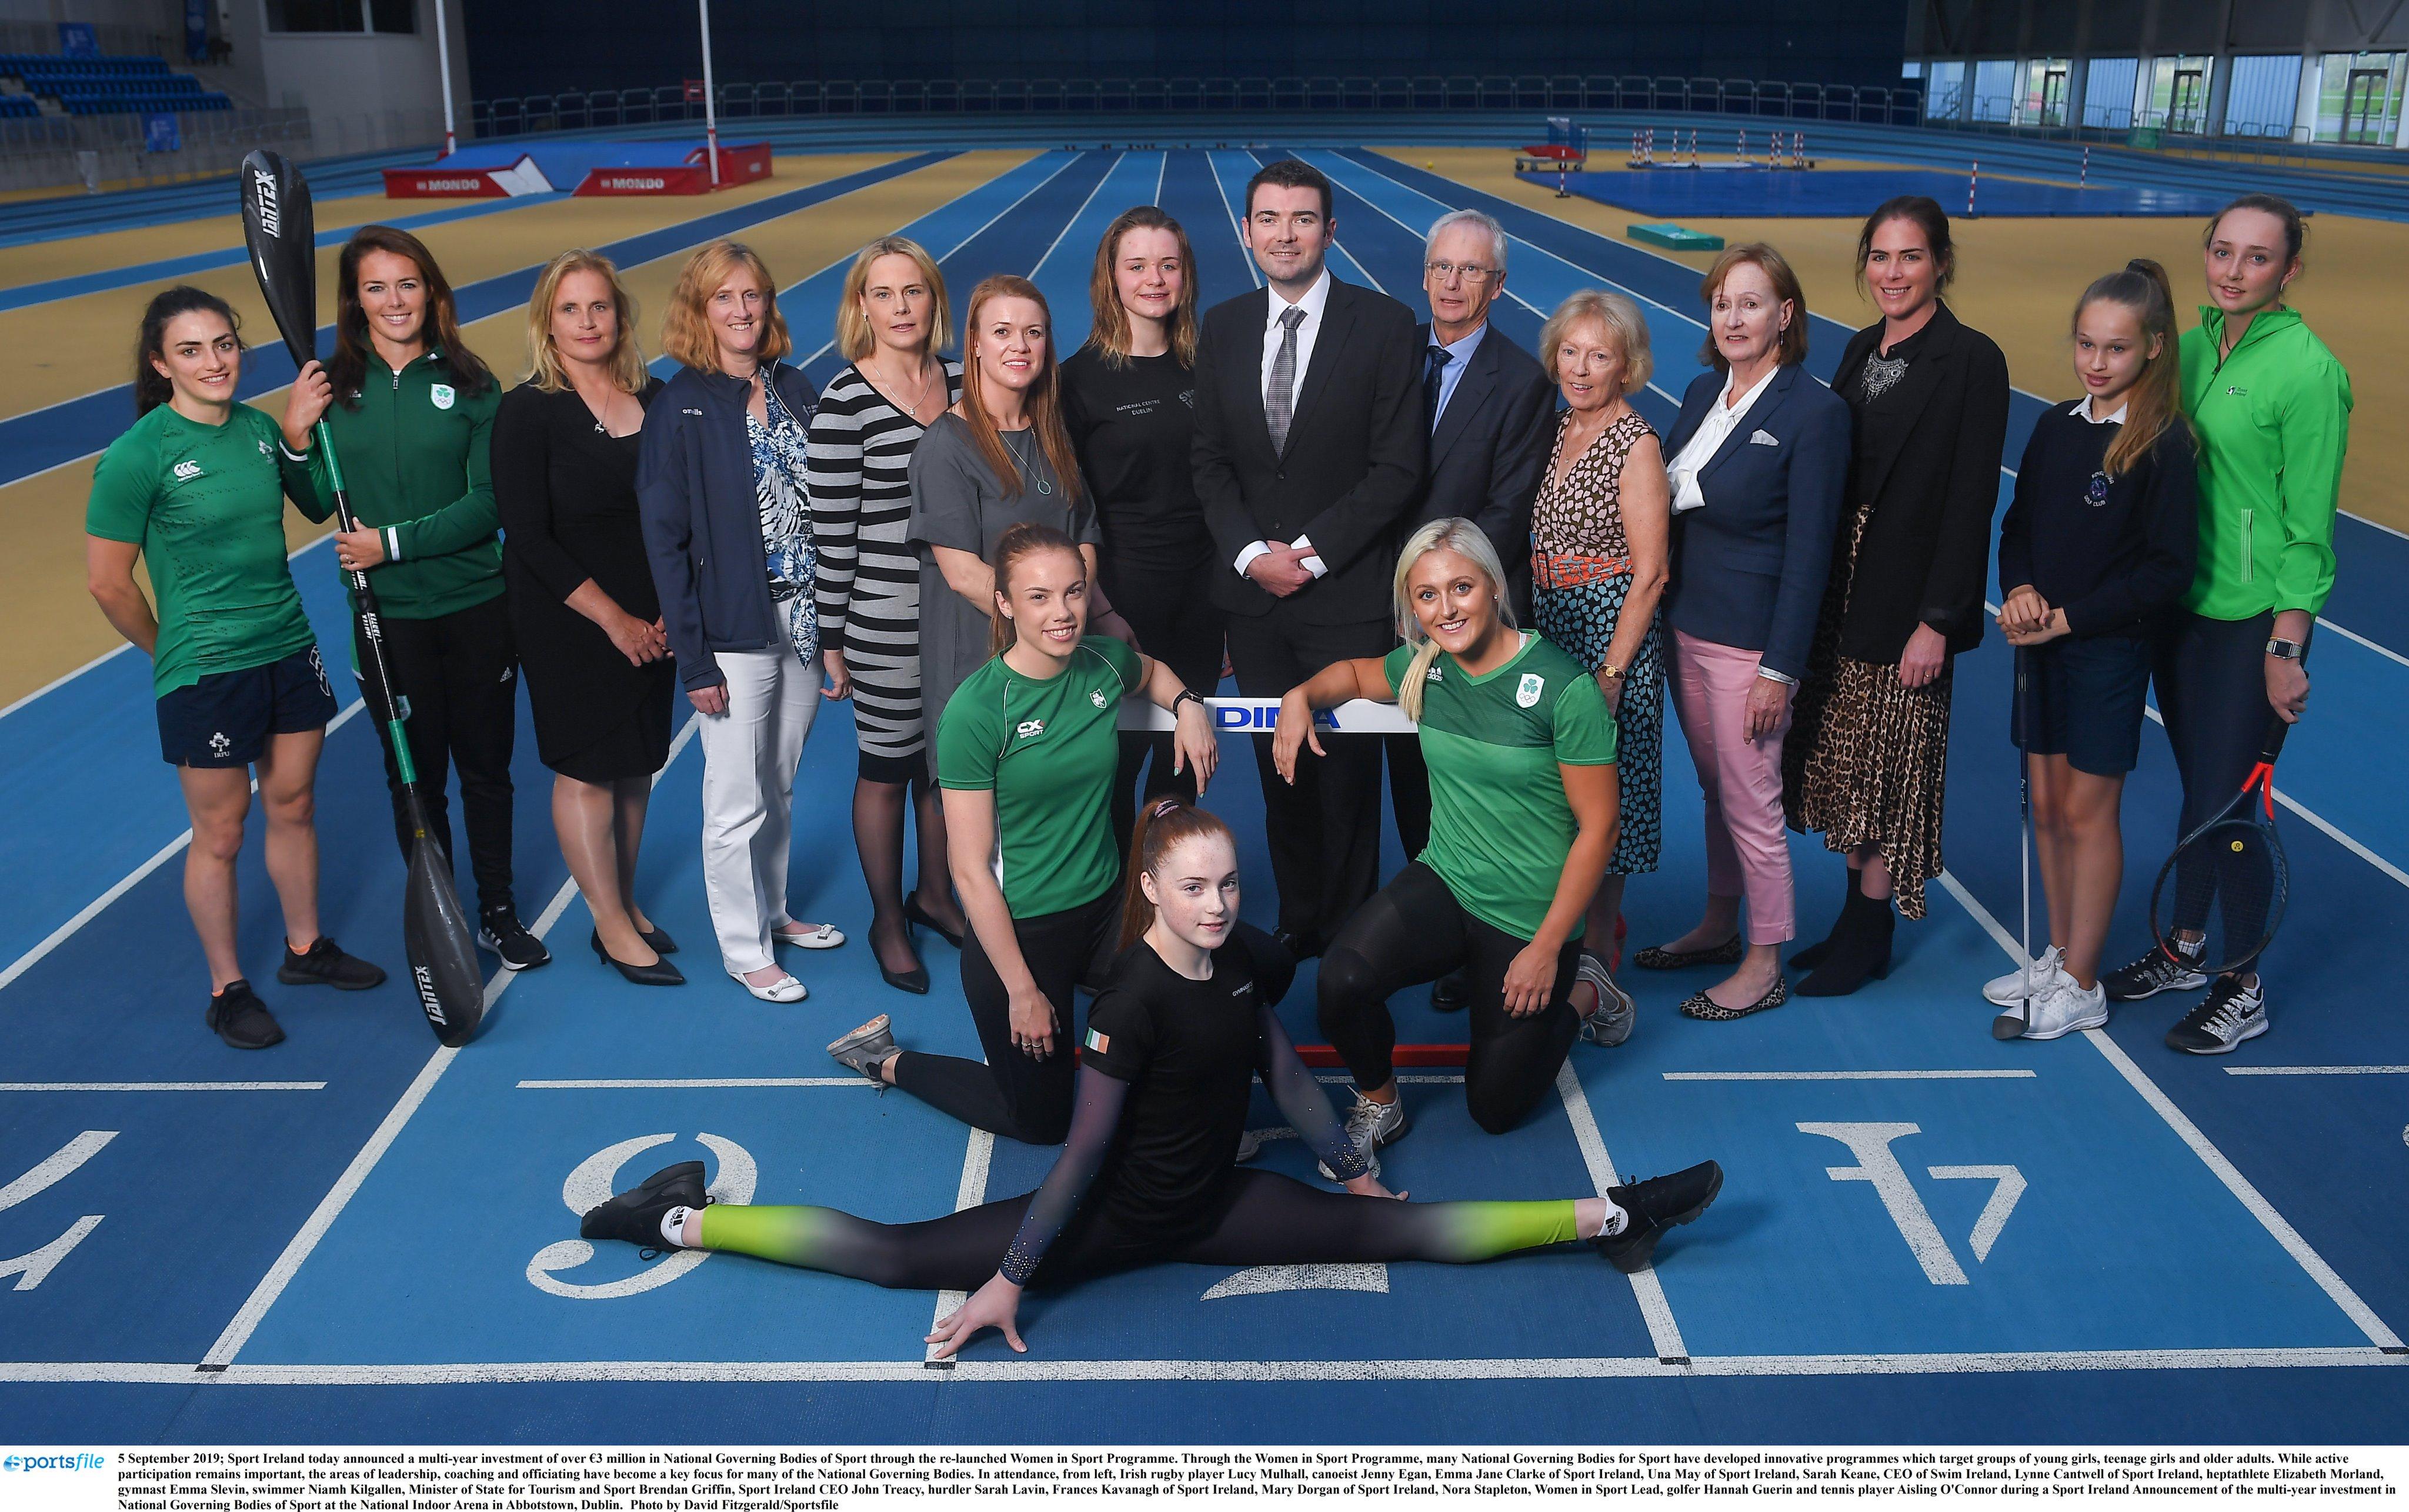 Sport Ireland Announces €3 Million Investment in Women in Sport